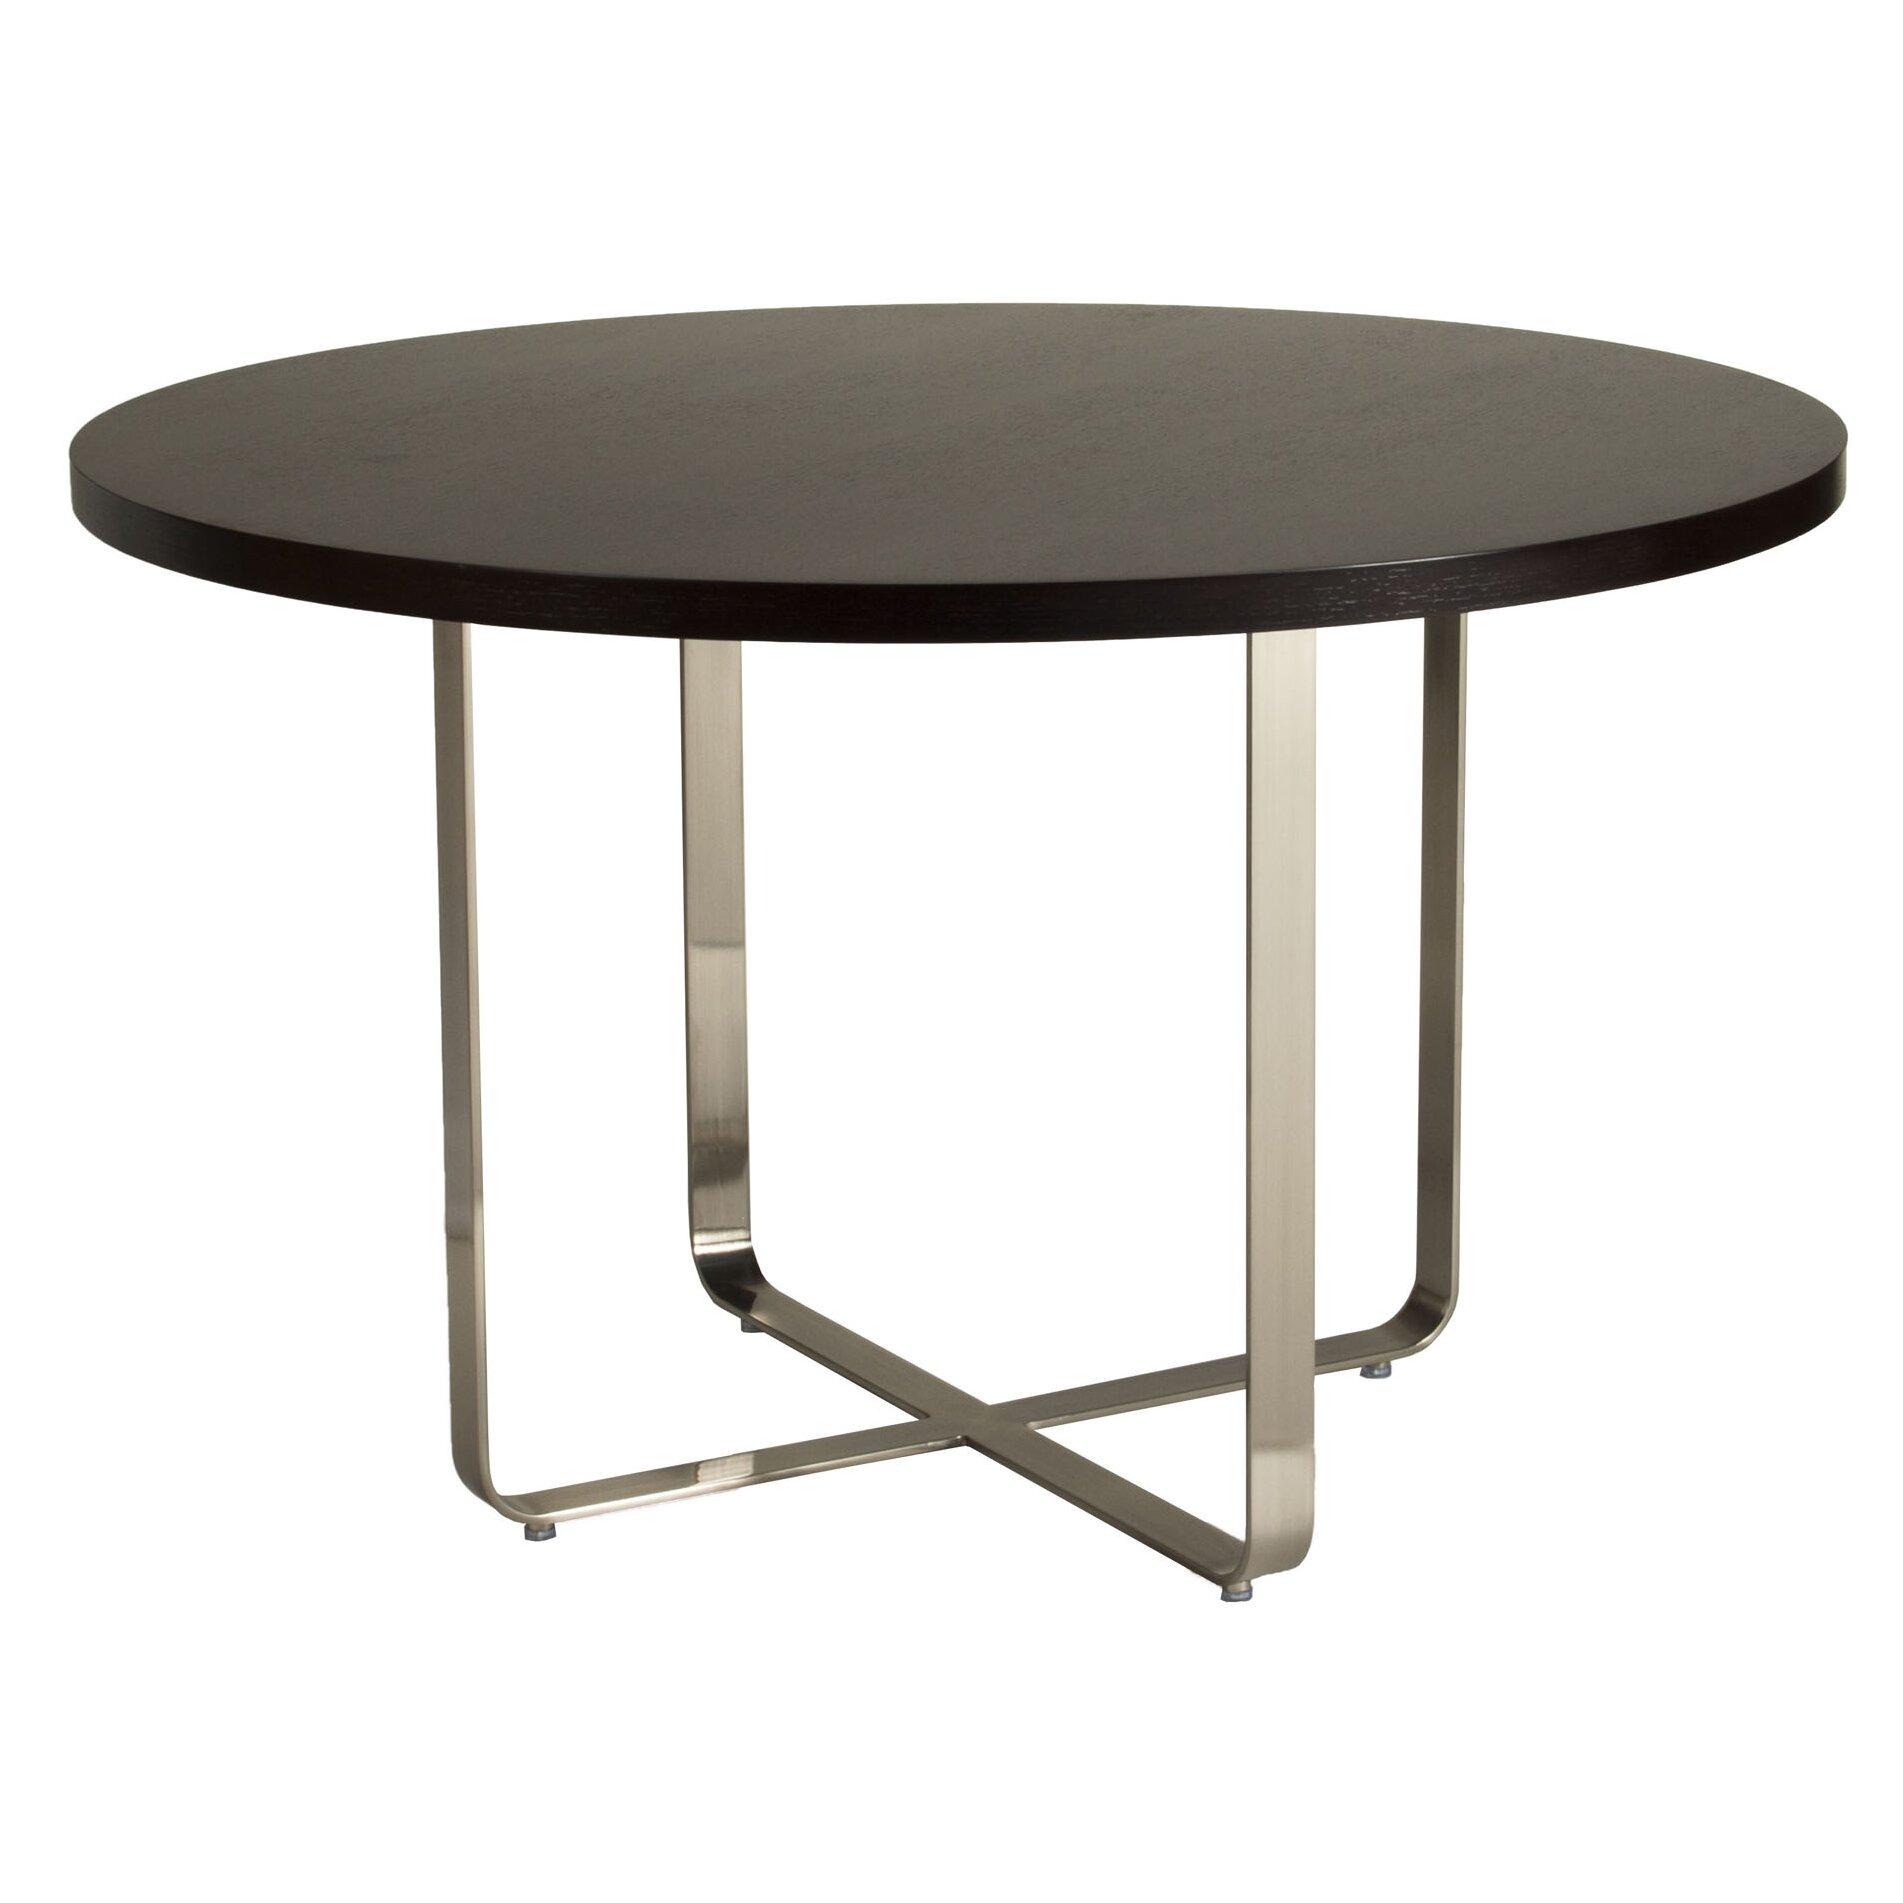 Allan Copley Designs Artesia Dining Table Allmodern